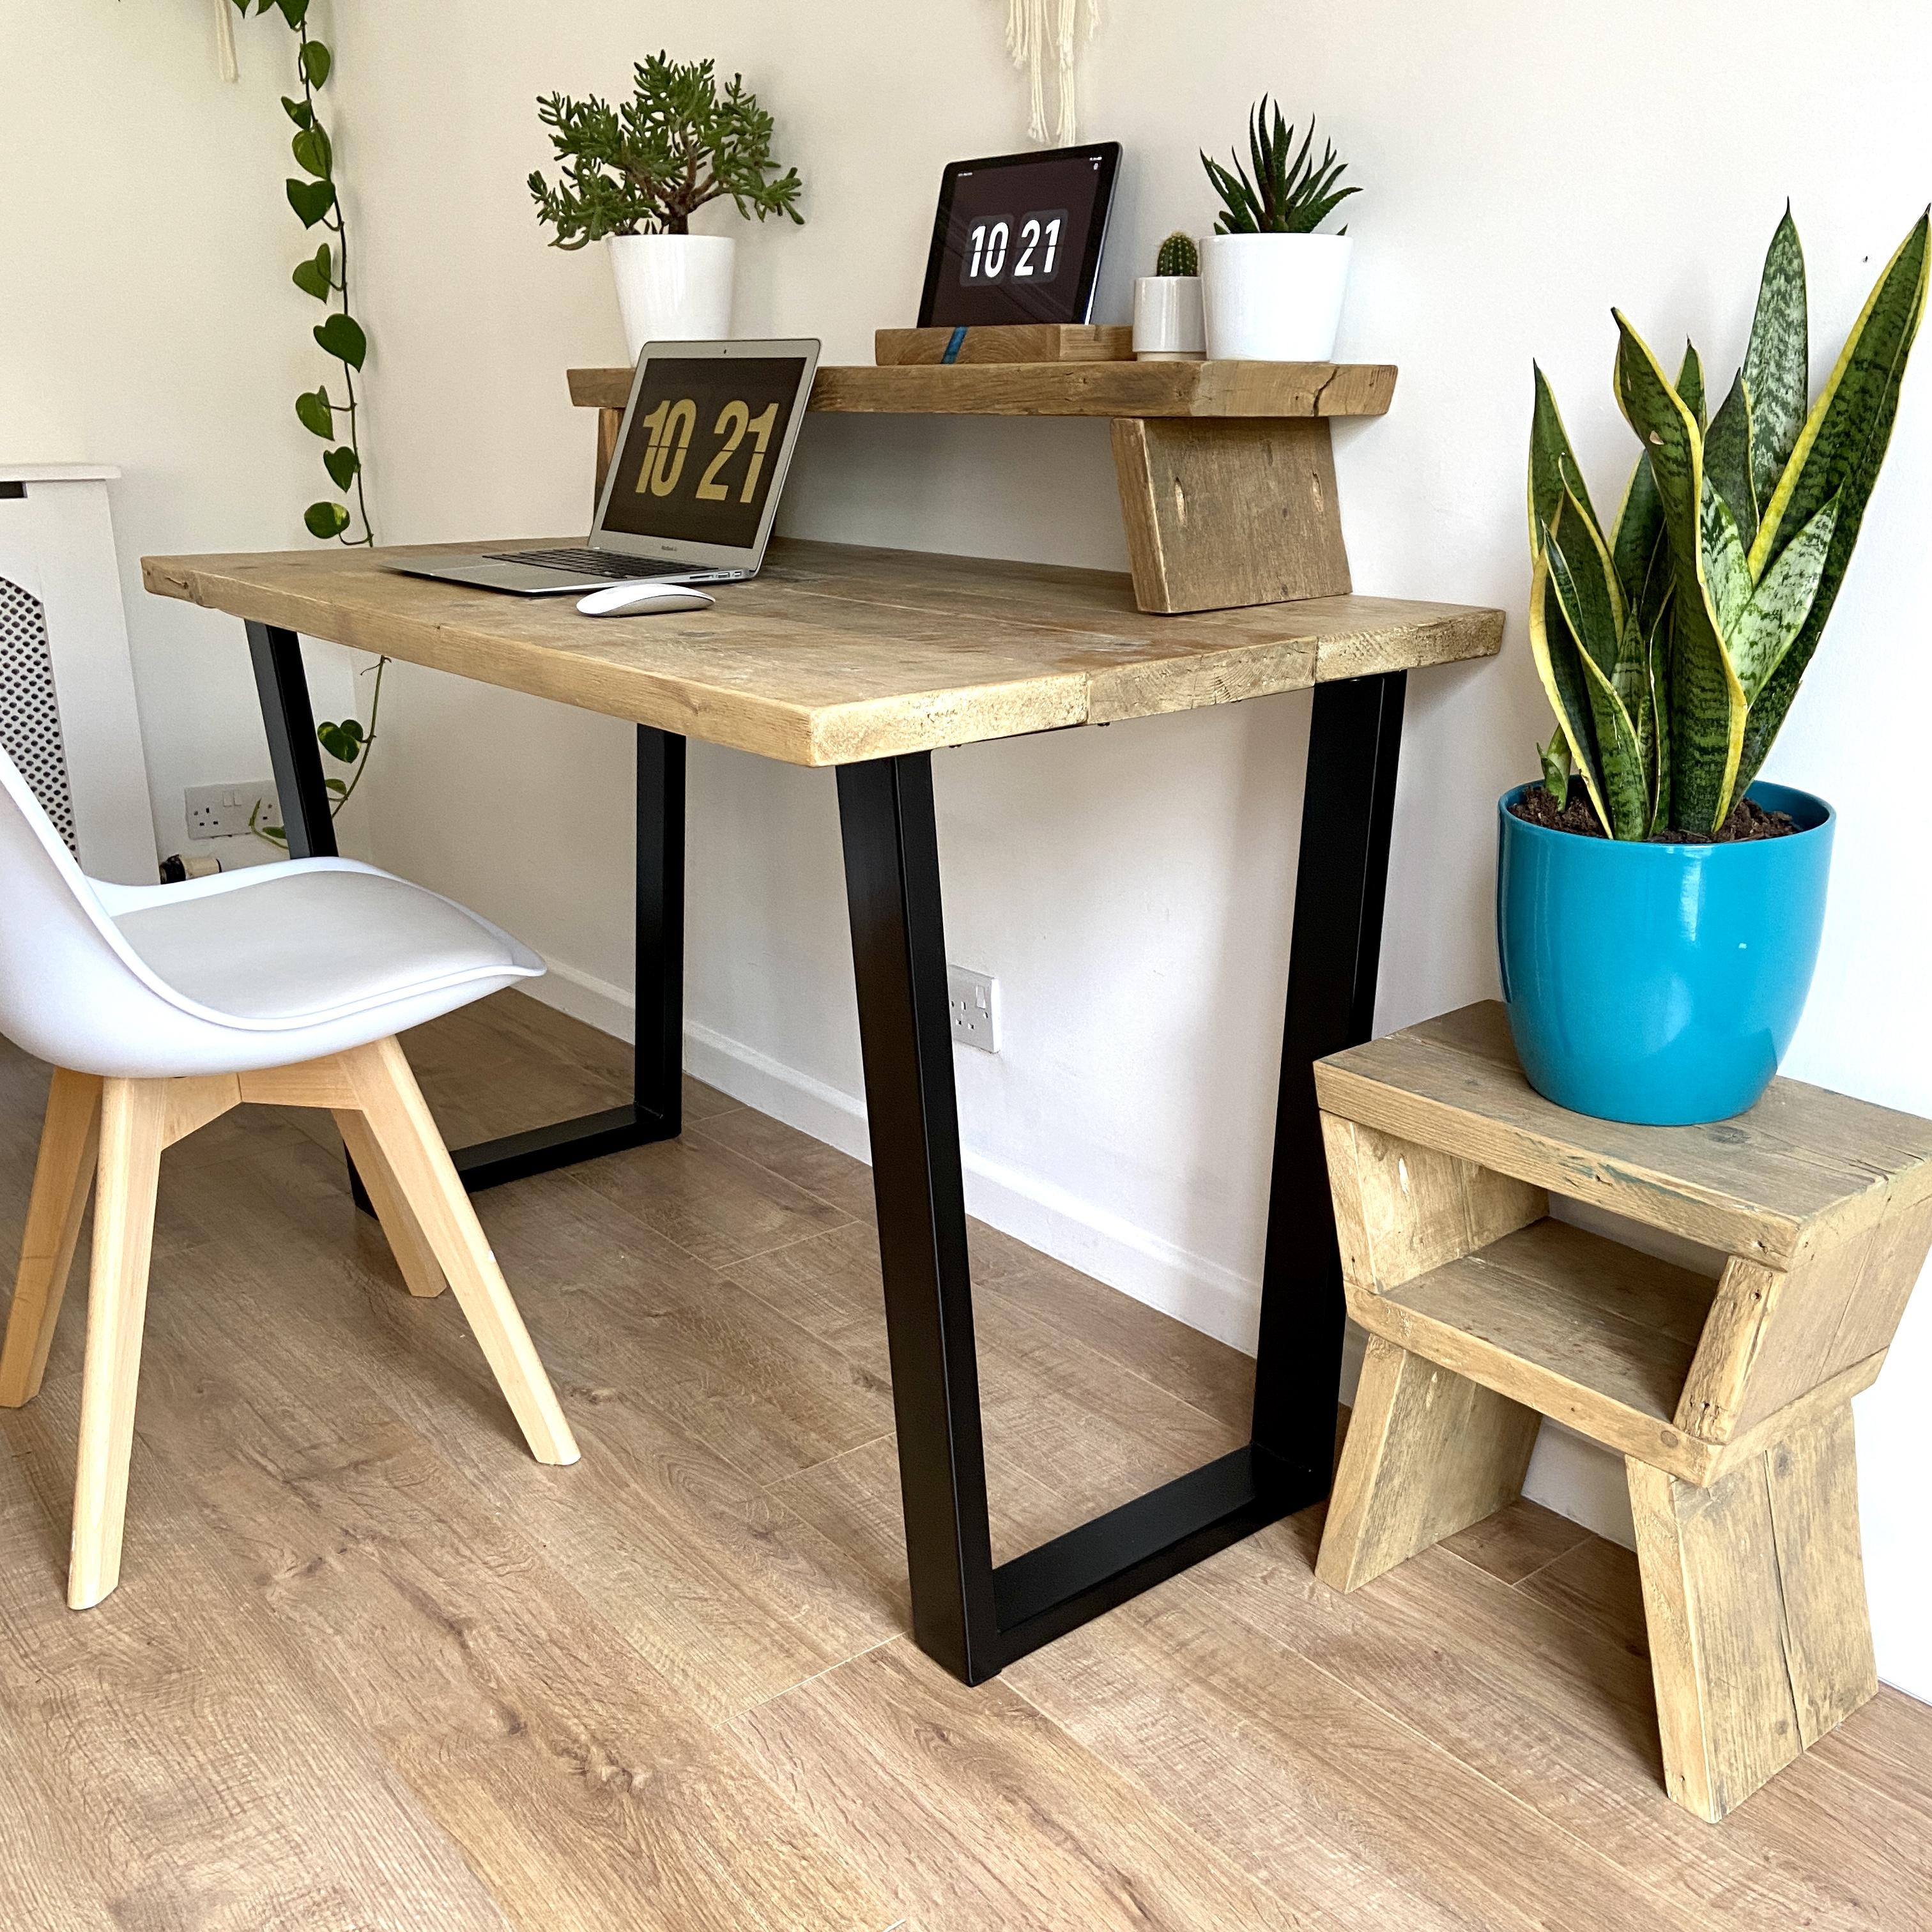 inverted trapezium leg desk